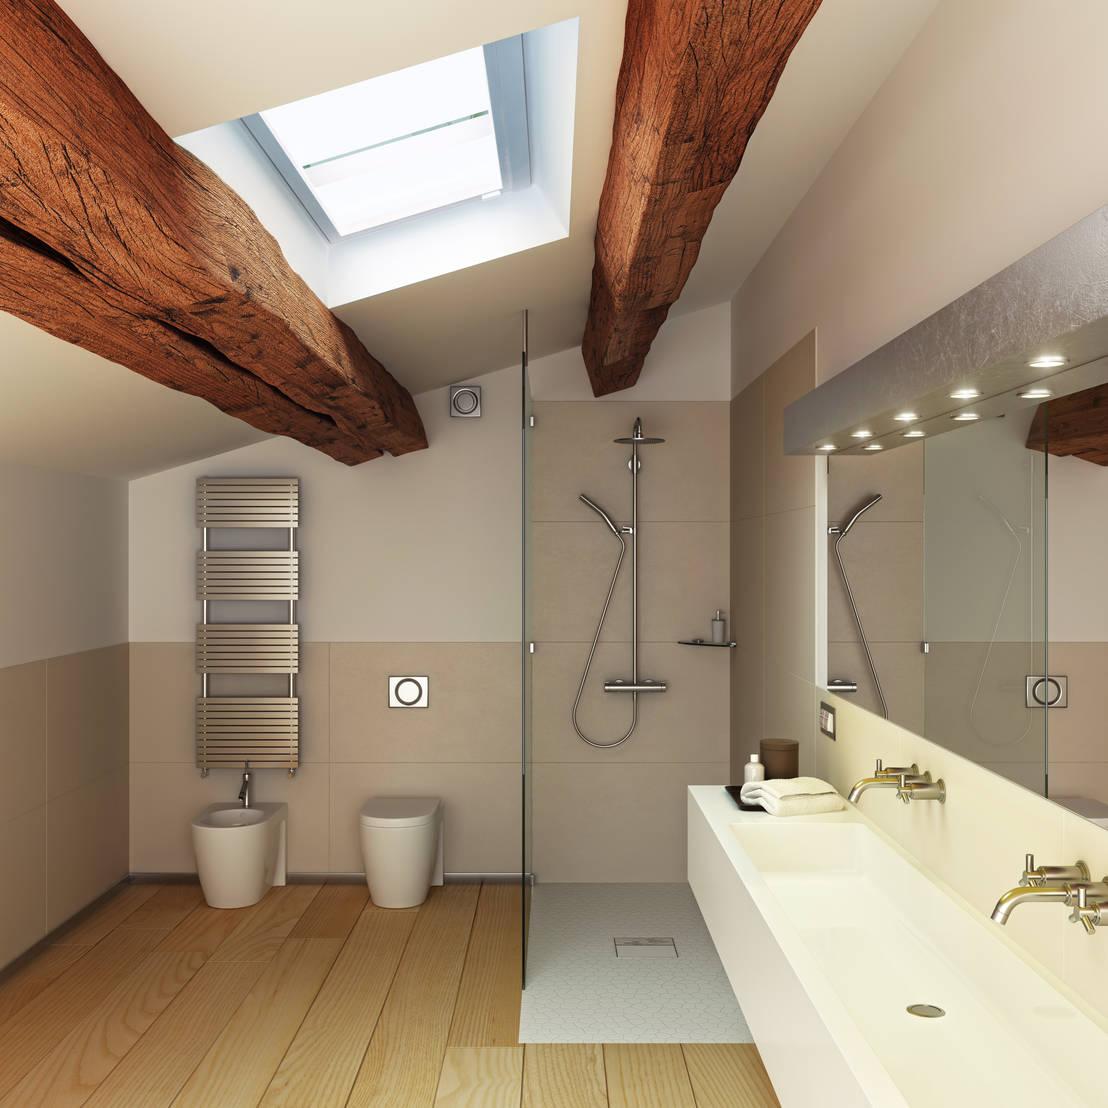 bodengleiche dusche im altbau dank plancofix di jung pumpen gmbh homify. Black Bedroom Furniture Sets. Home Design Ideas